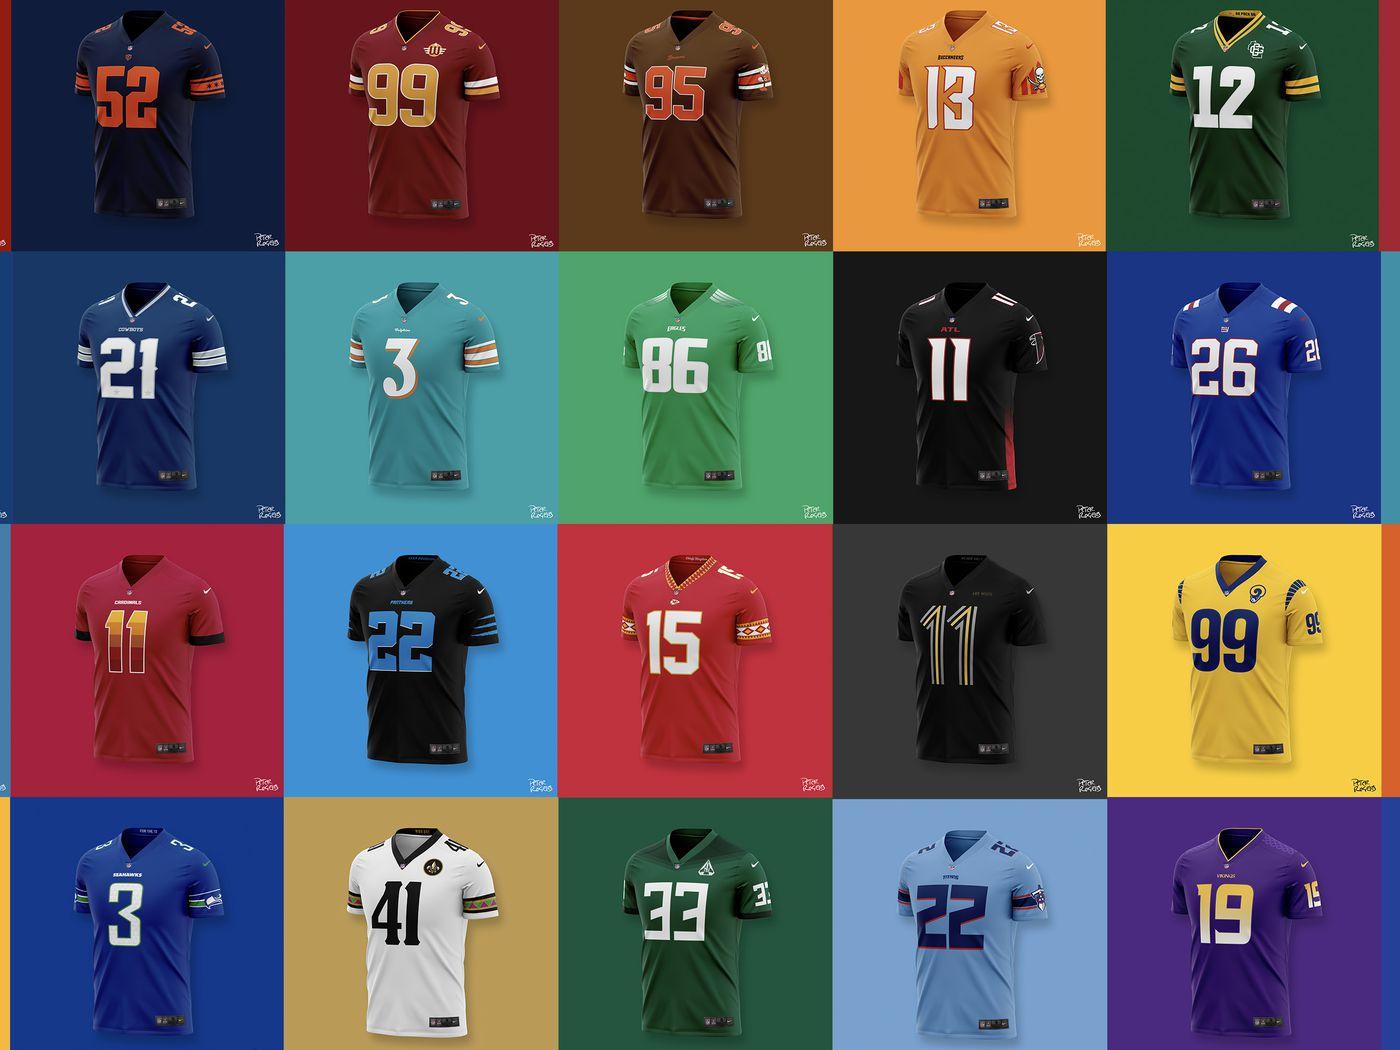 buy official nfl jerseys